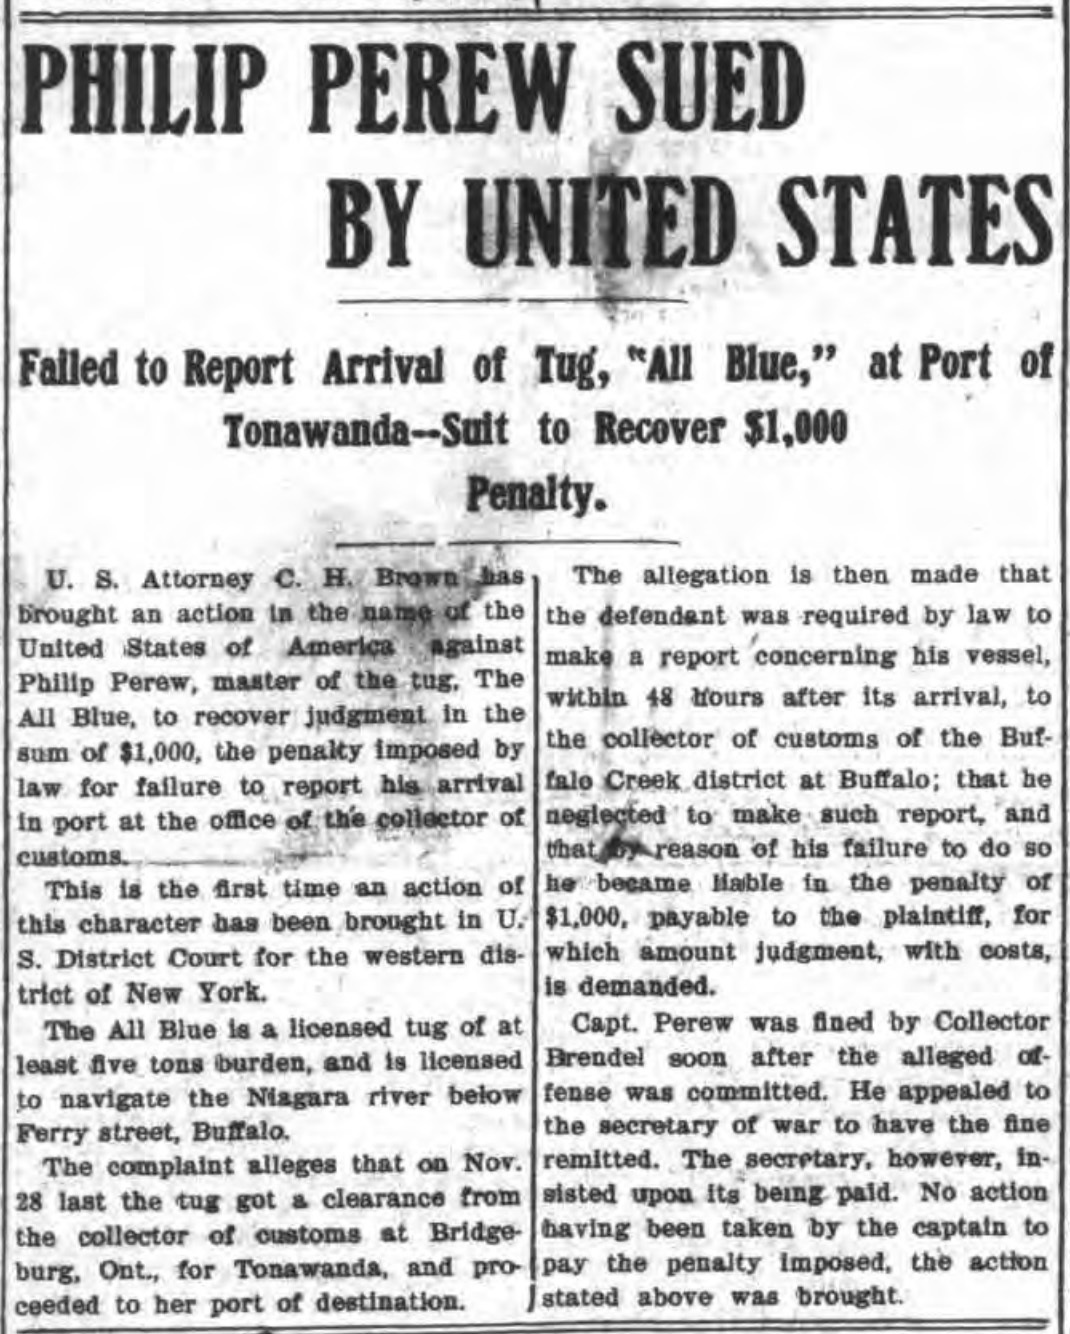 Philip Perew suide by United States, article (Tonawanda News, 1905-12-16).jpg